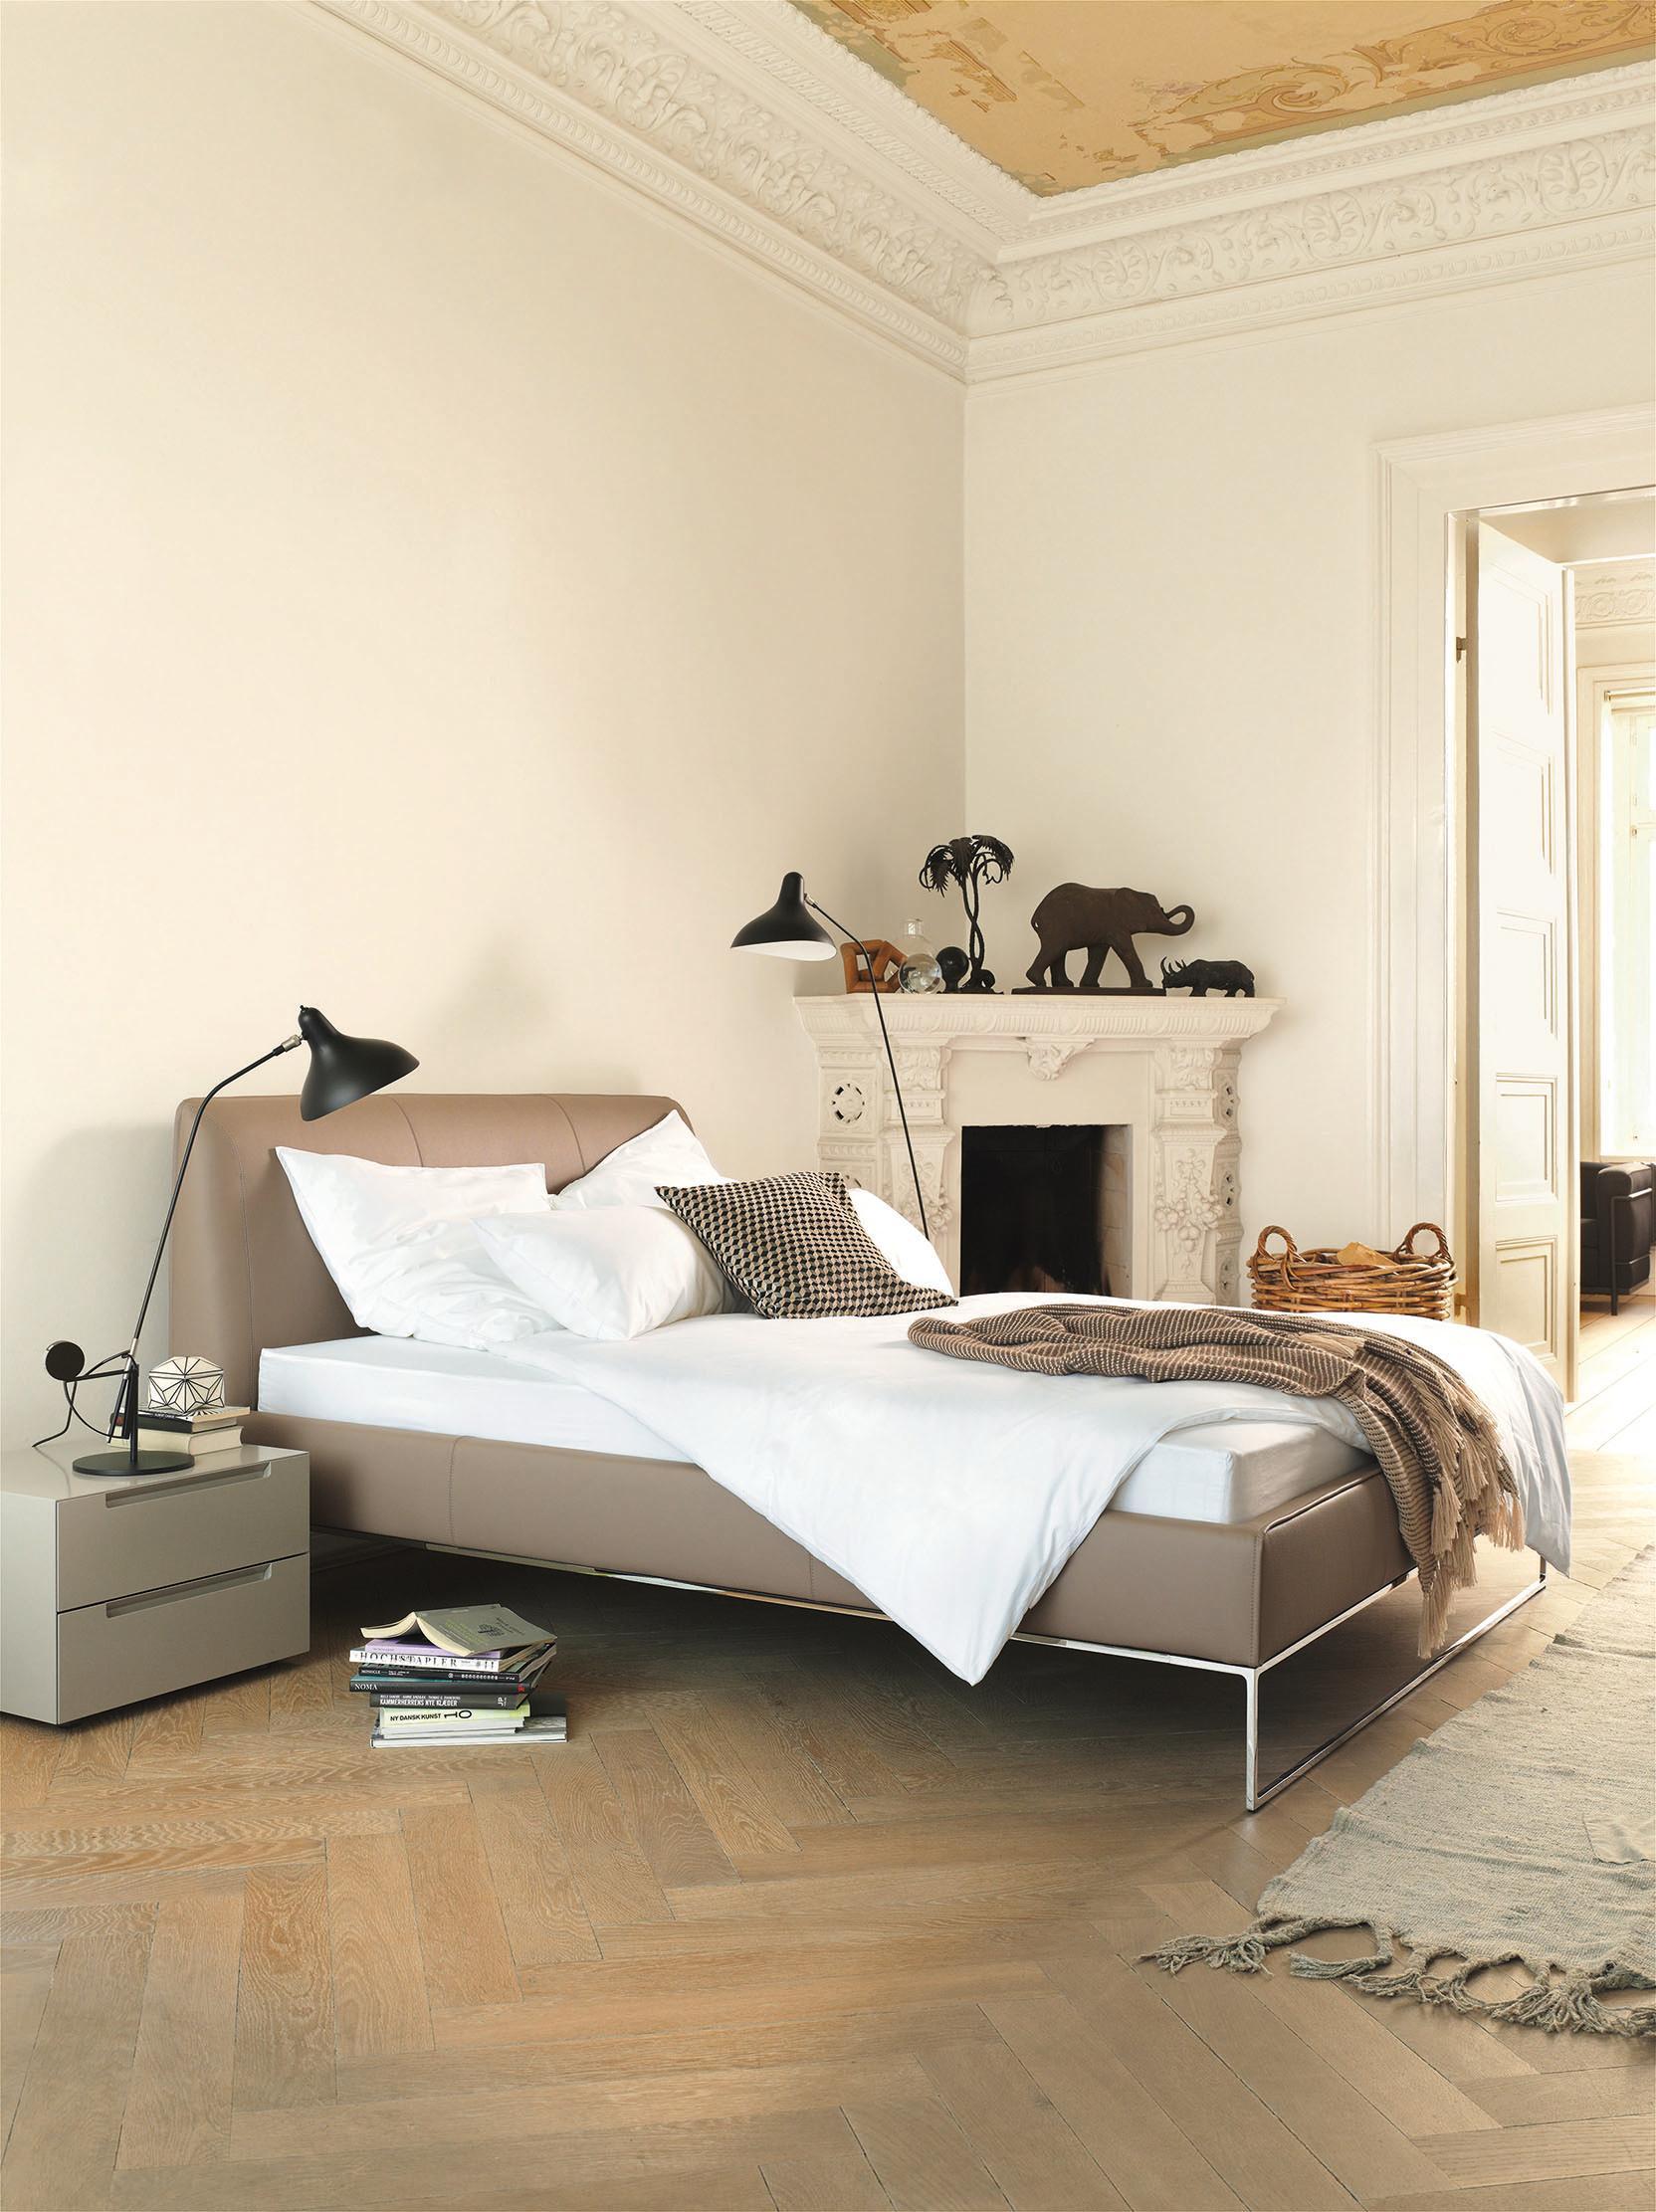 Stuckdecke bilder ideen couchstyle - Boxspringbett tagesdecke ...